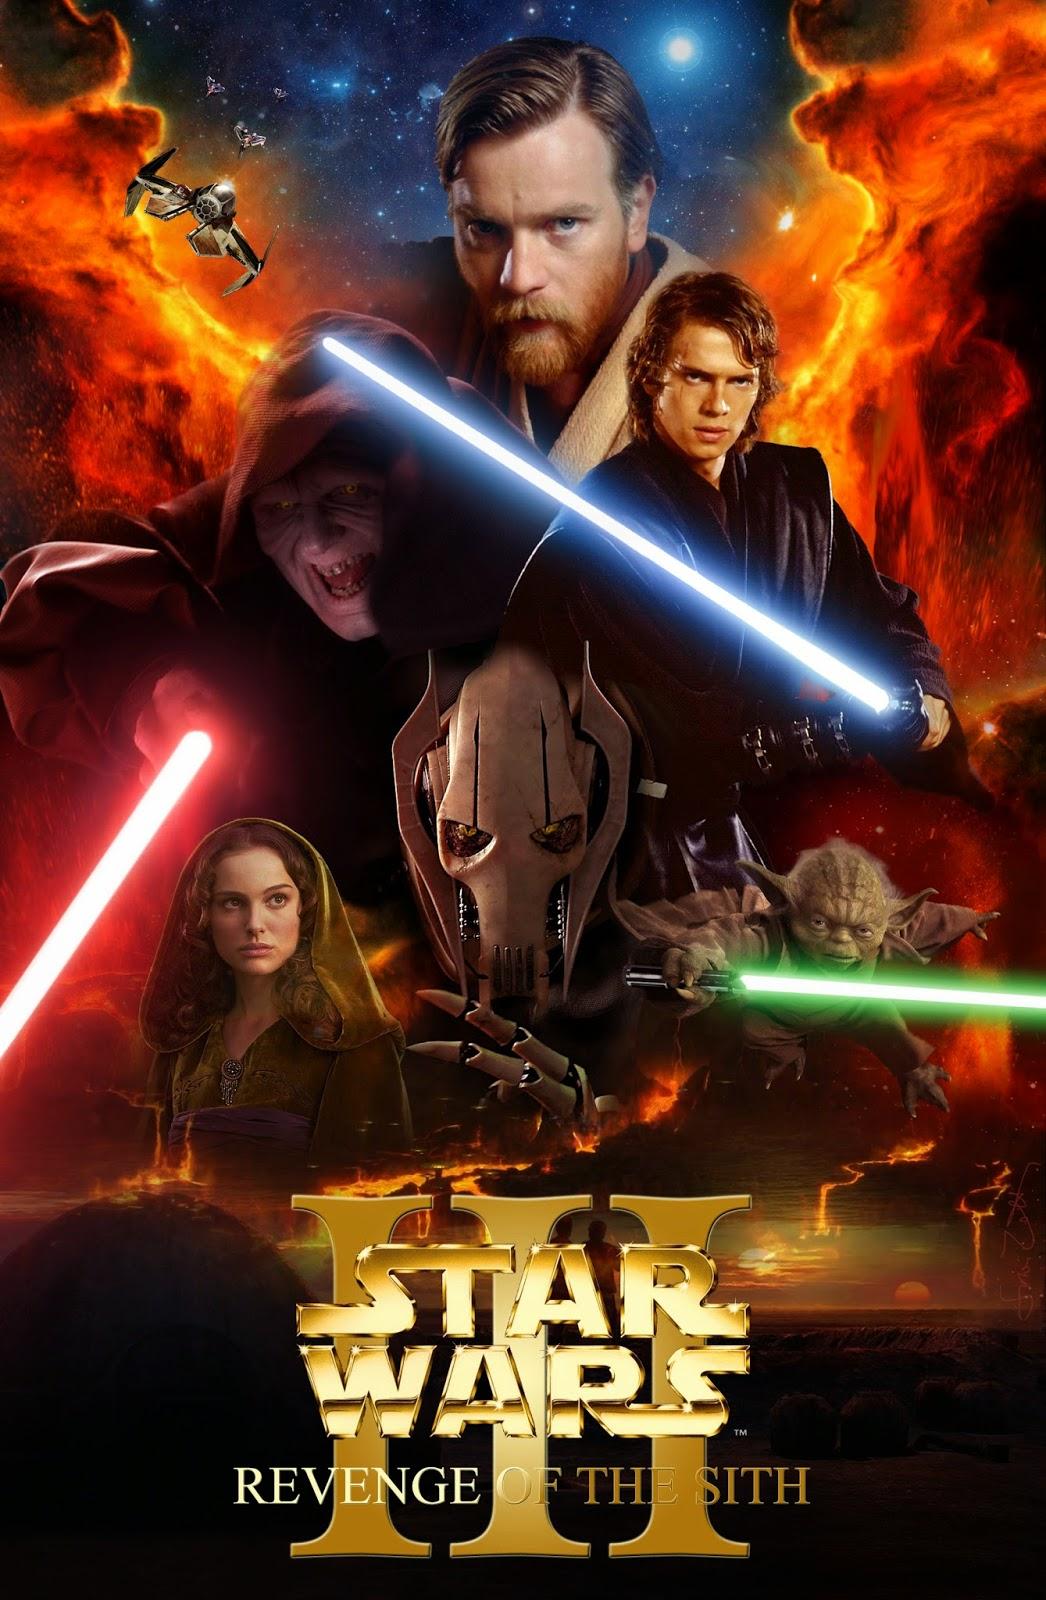 Star Wars Episode 3 Revenge of the Sith สตาร์ วอร์ส เอพพิโซด 3 ซิธชำระแค้น [HD]